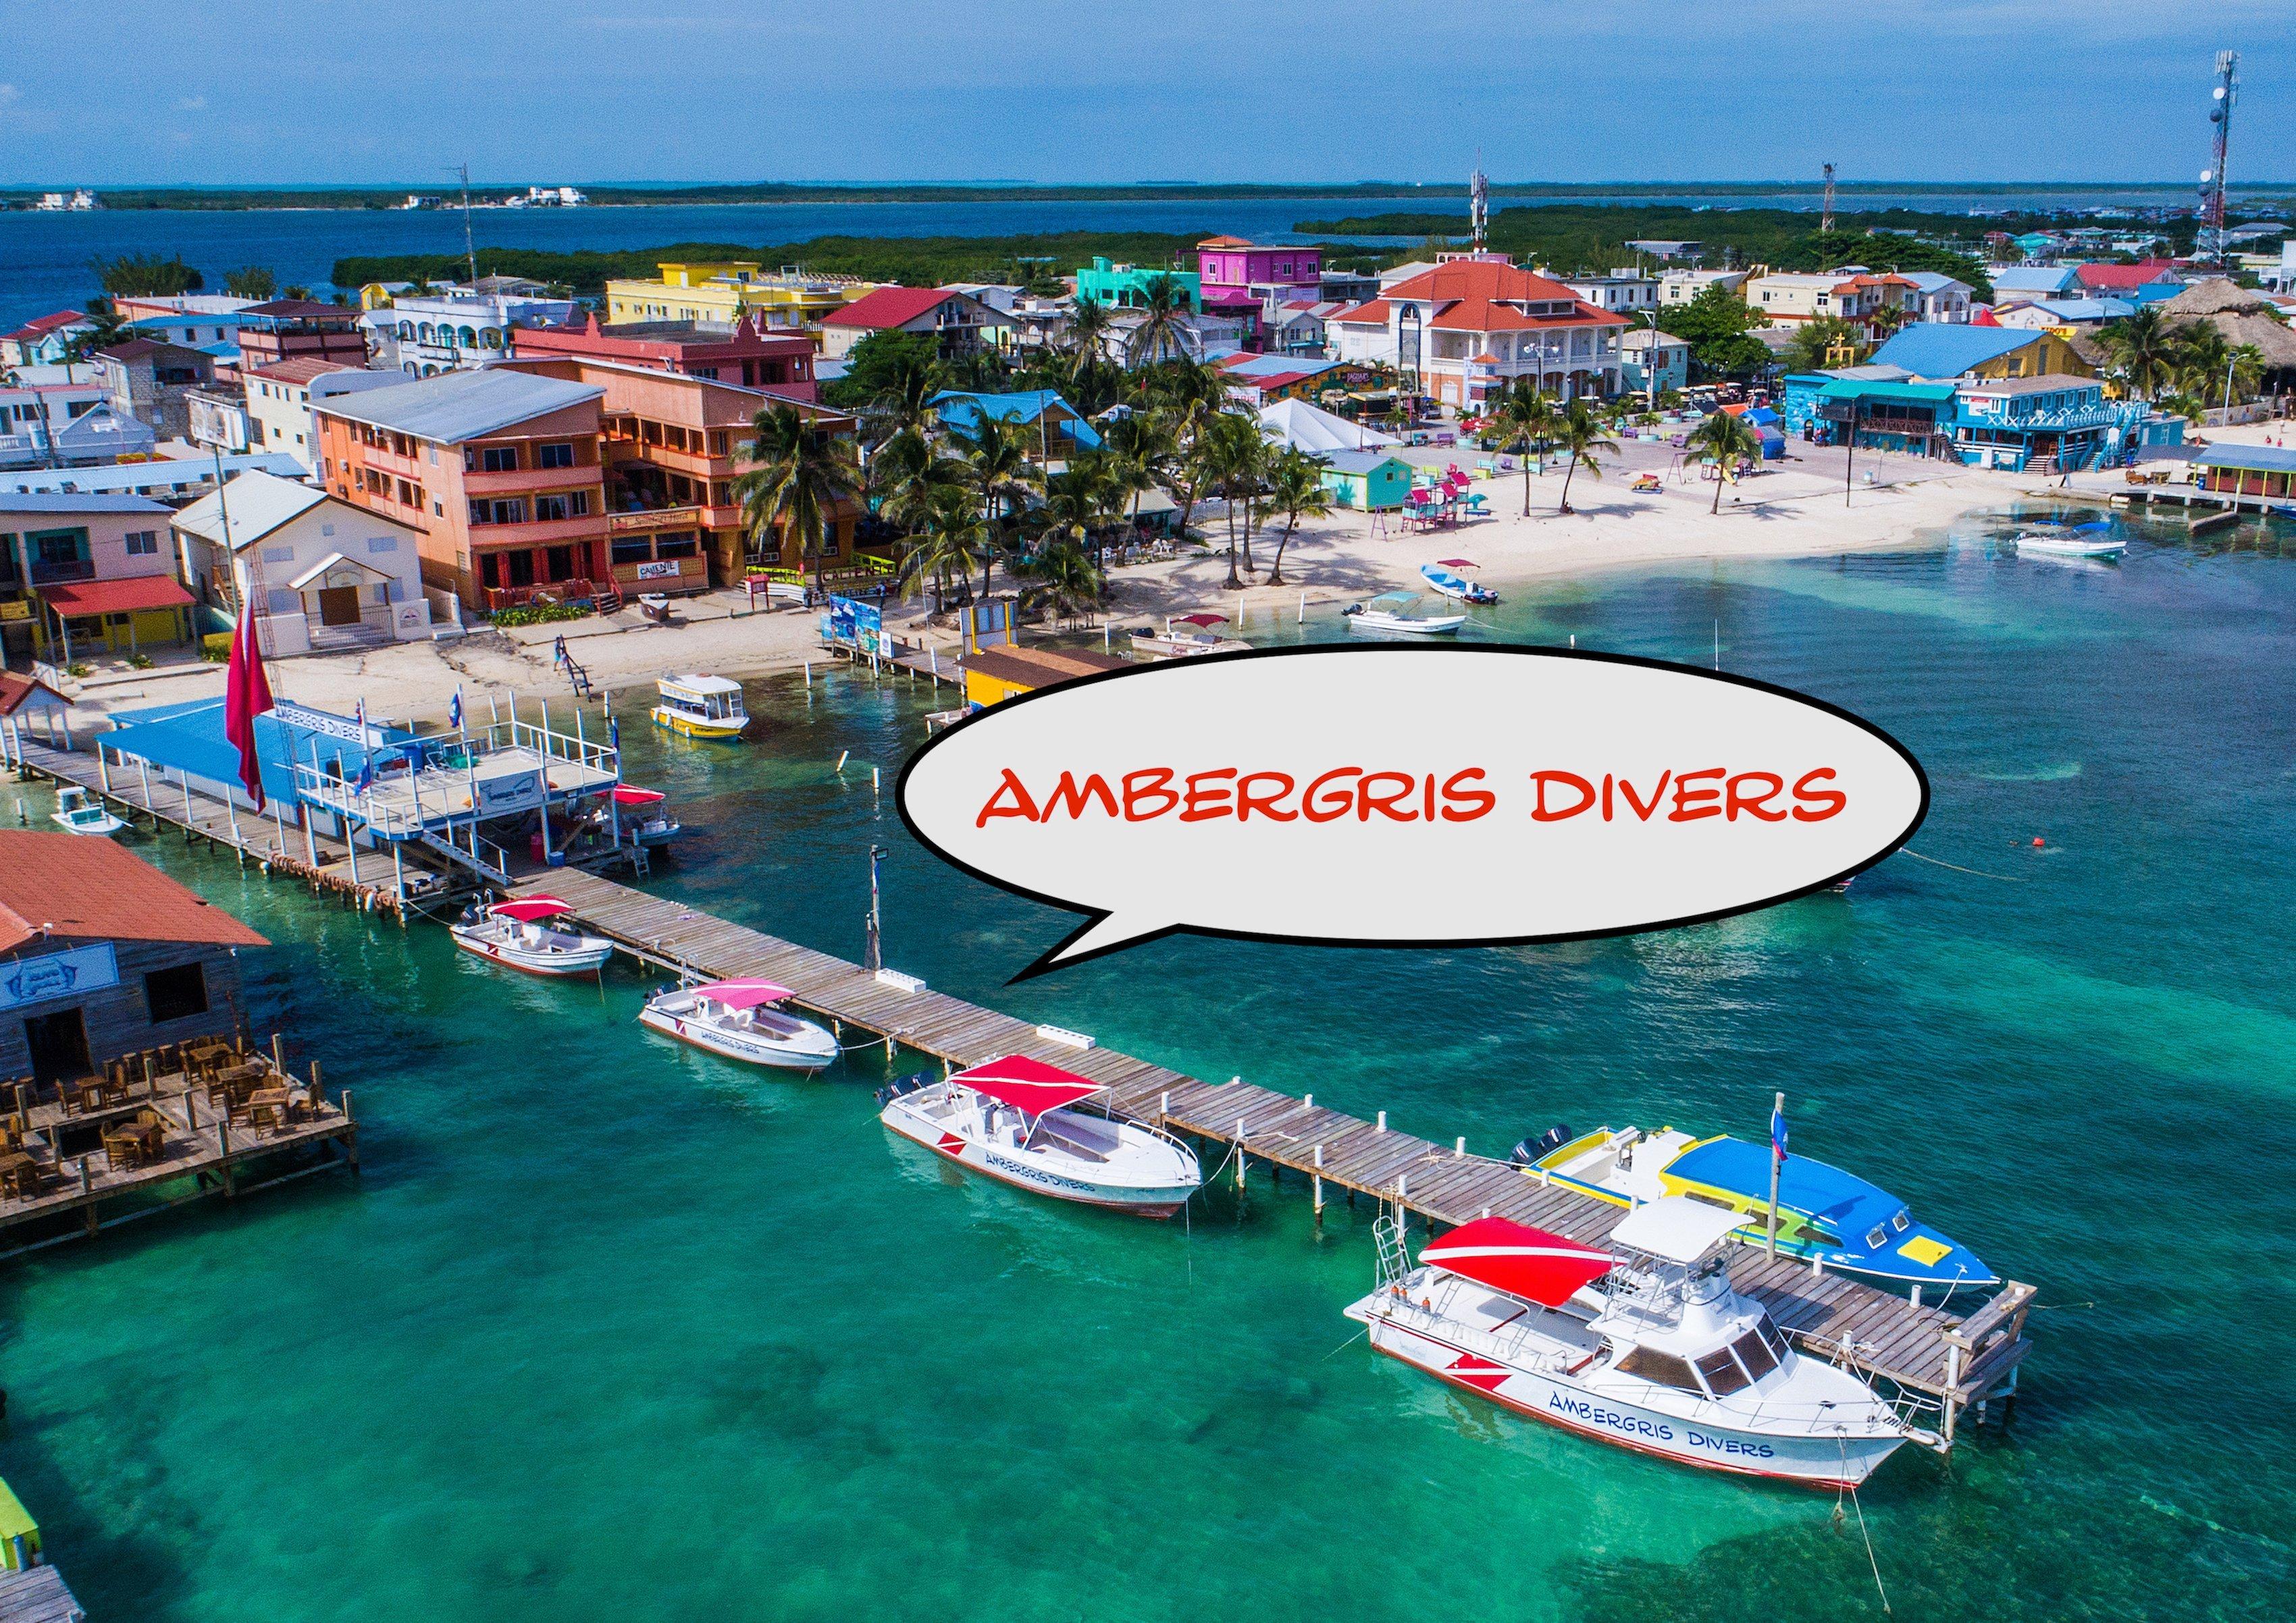 Ambergris Diver's Dive Shop Aerial